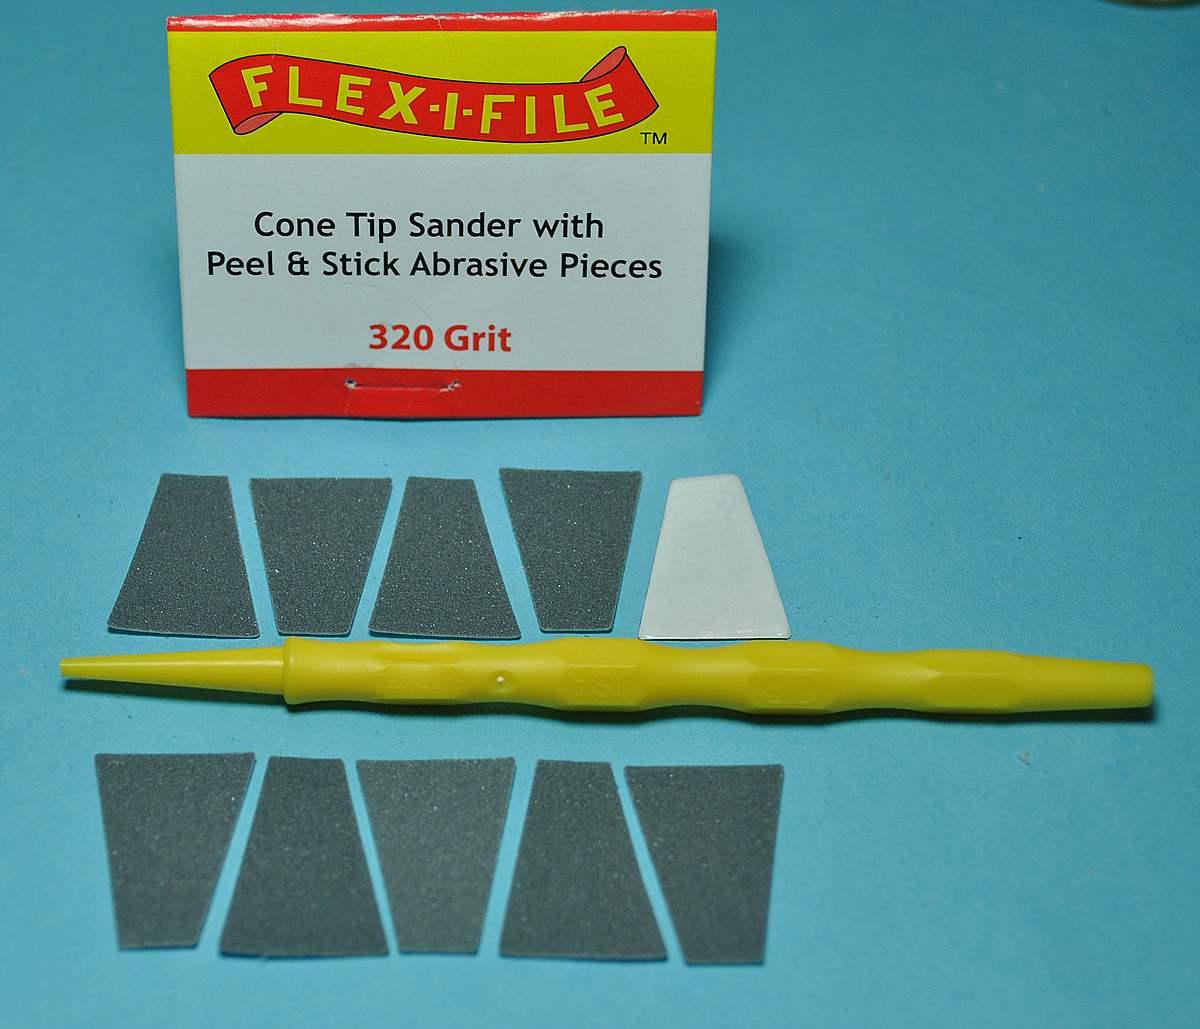 Flex-i-File-Cone-Tip-Sanders-2 Flex-i-File Cone Tip Sanders